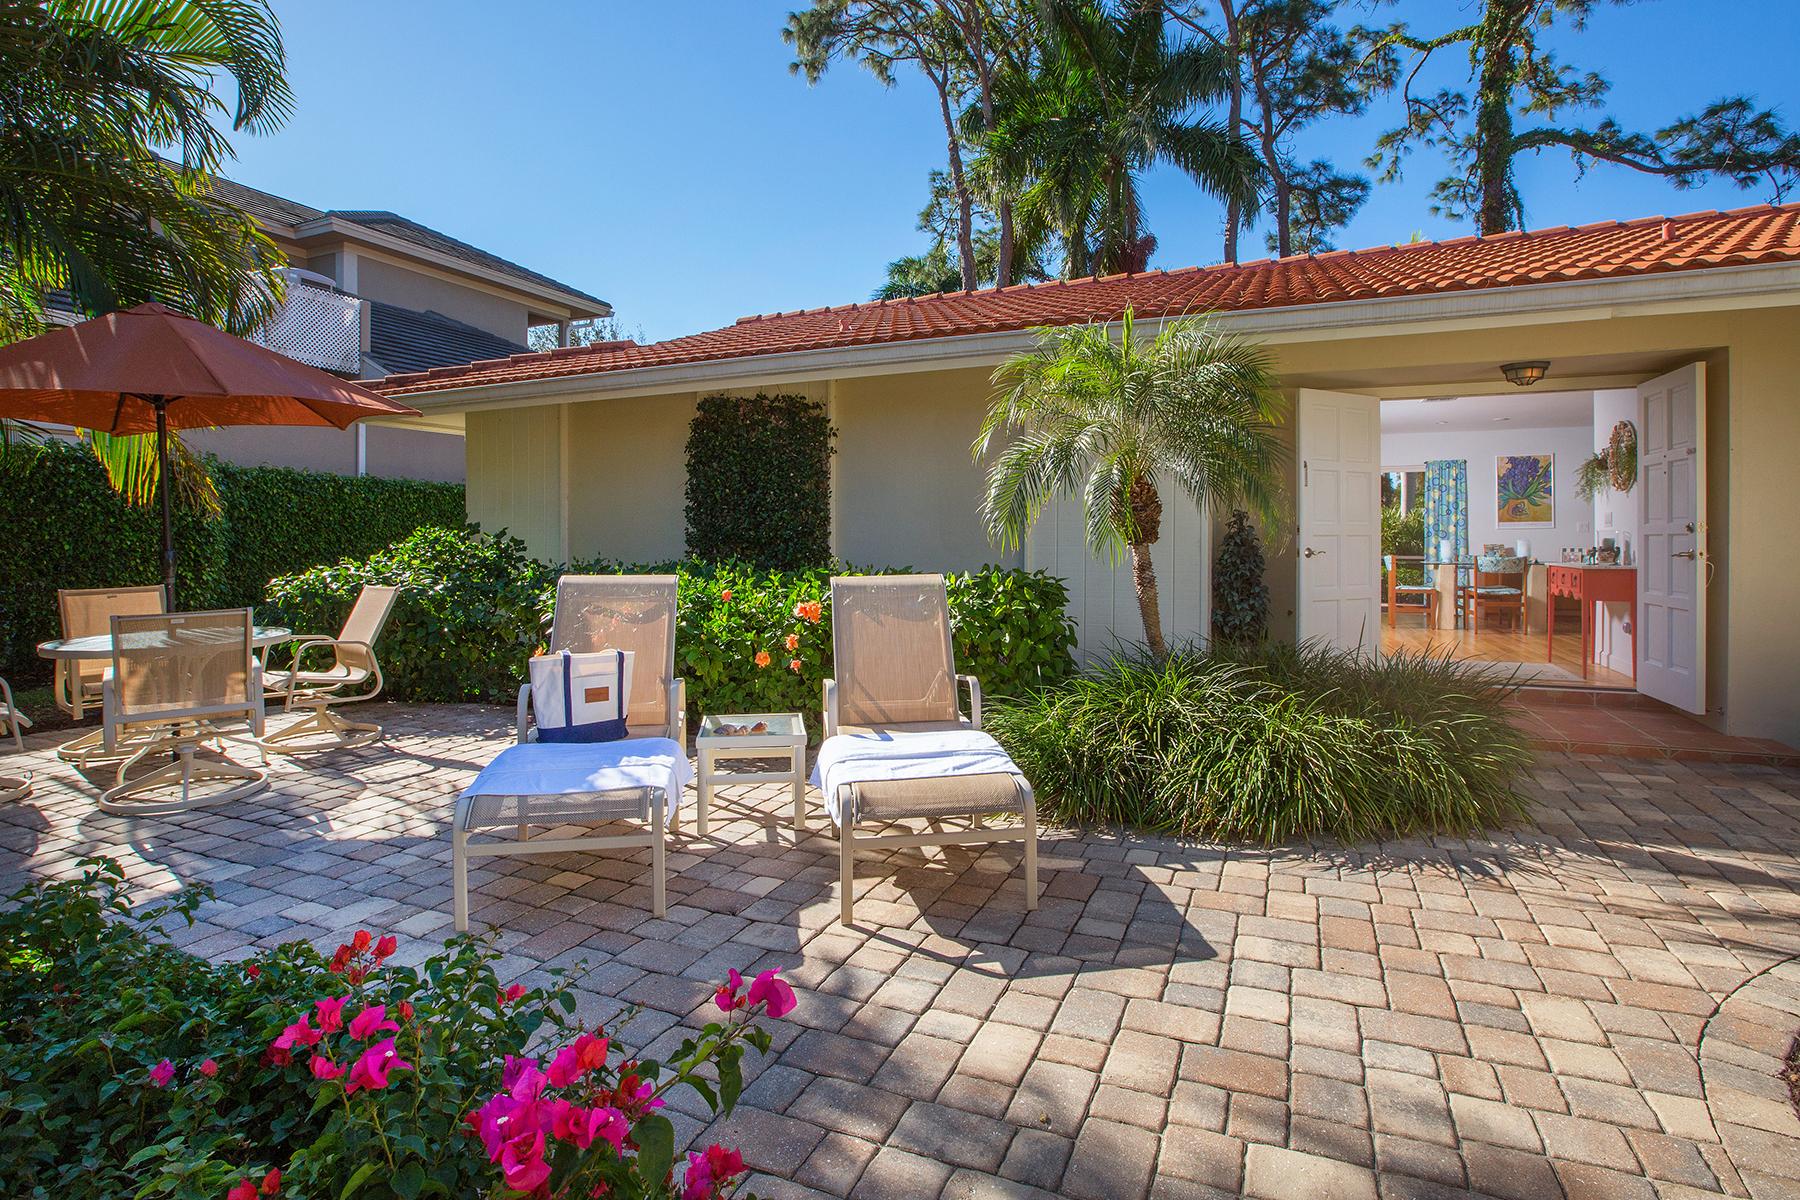 Villa per Vendita alle ore PARK SHORE - POINT WEST 765 Parkview Ln Naples, Florida, 34103 Stati Uniti